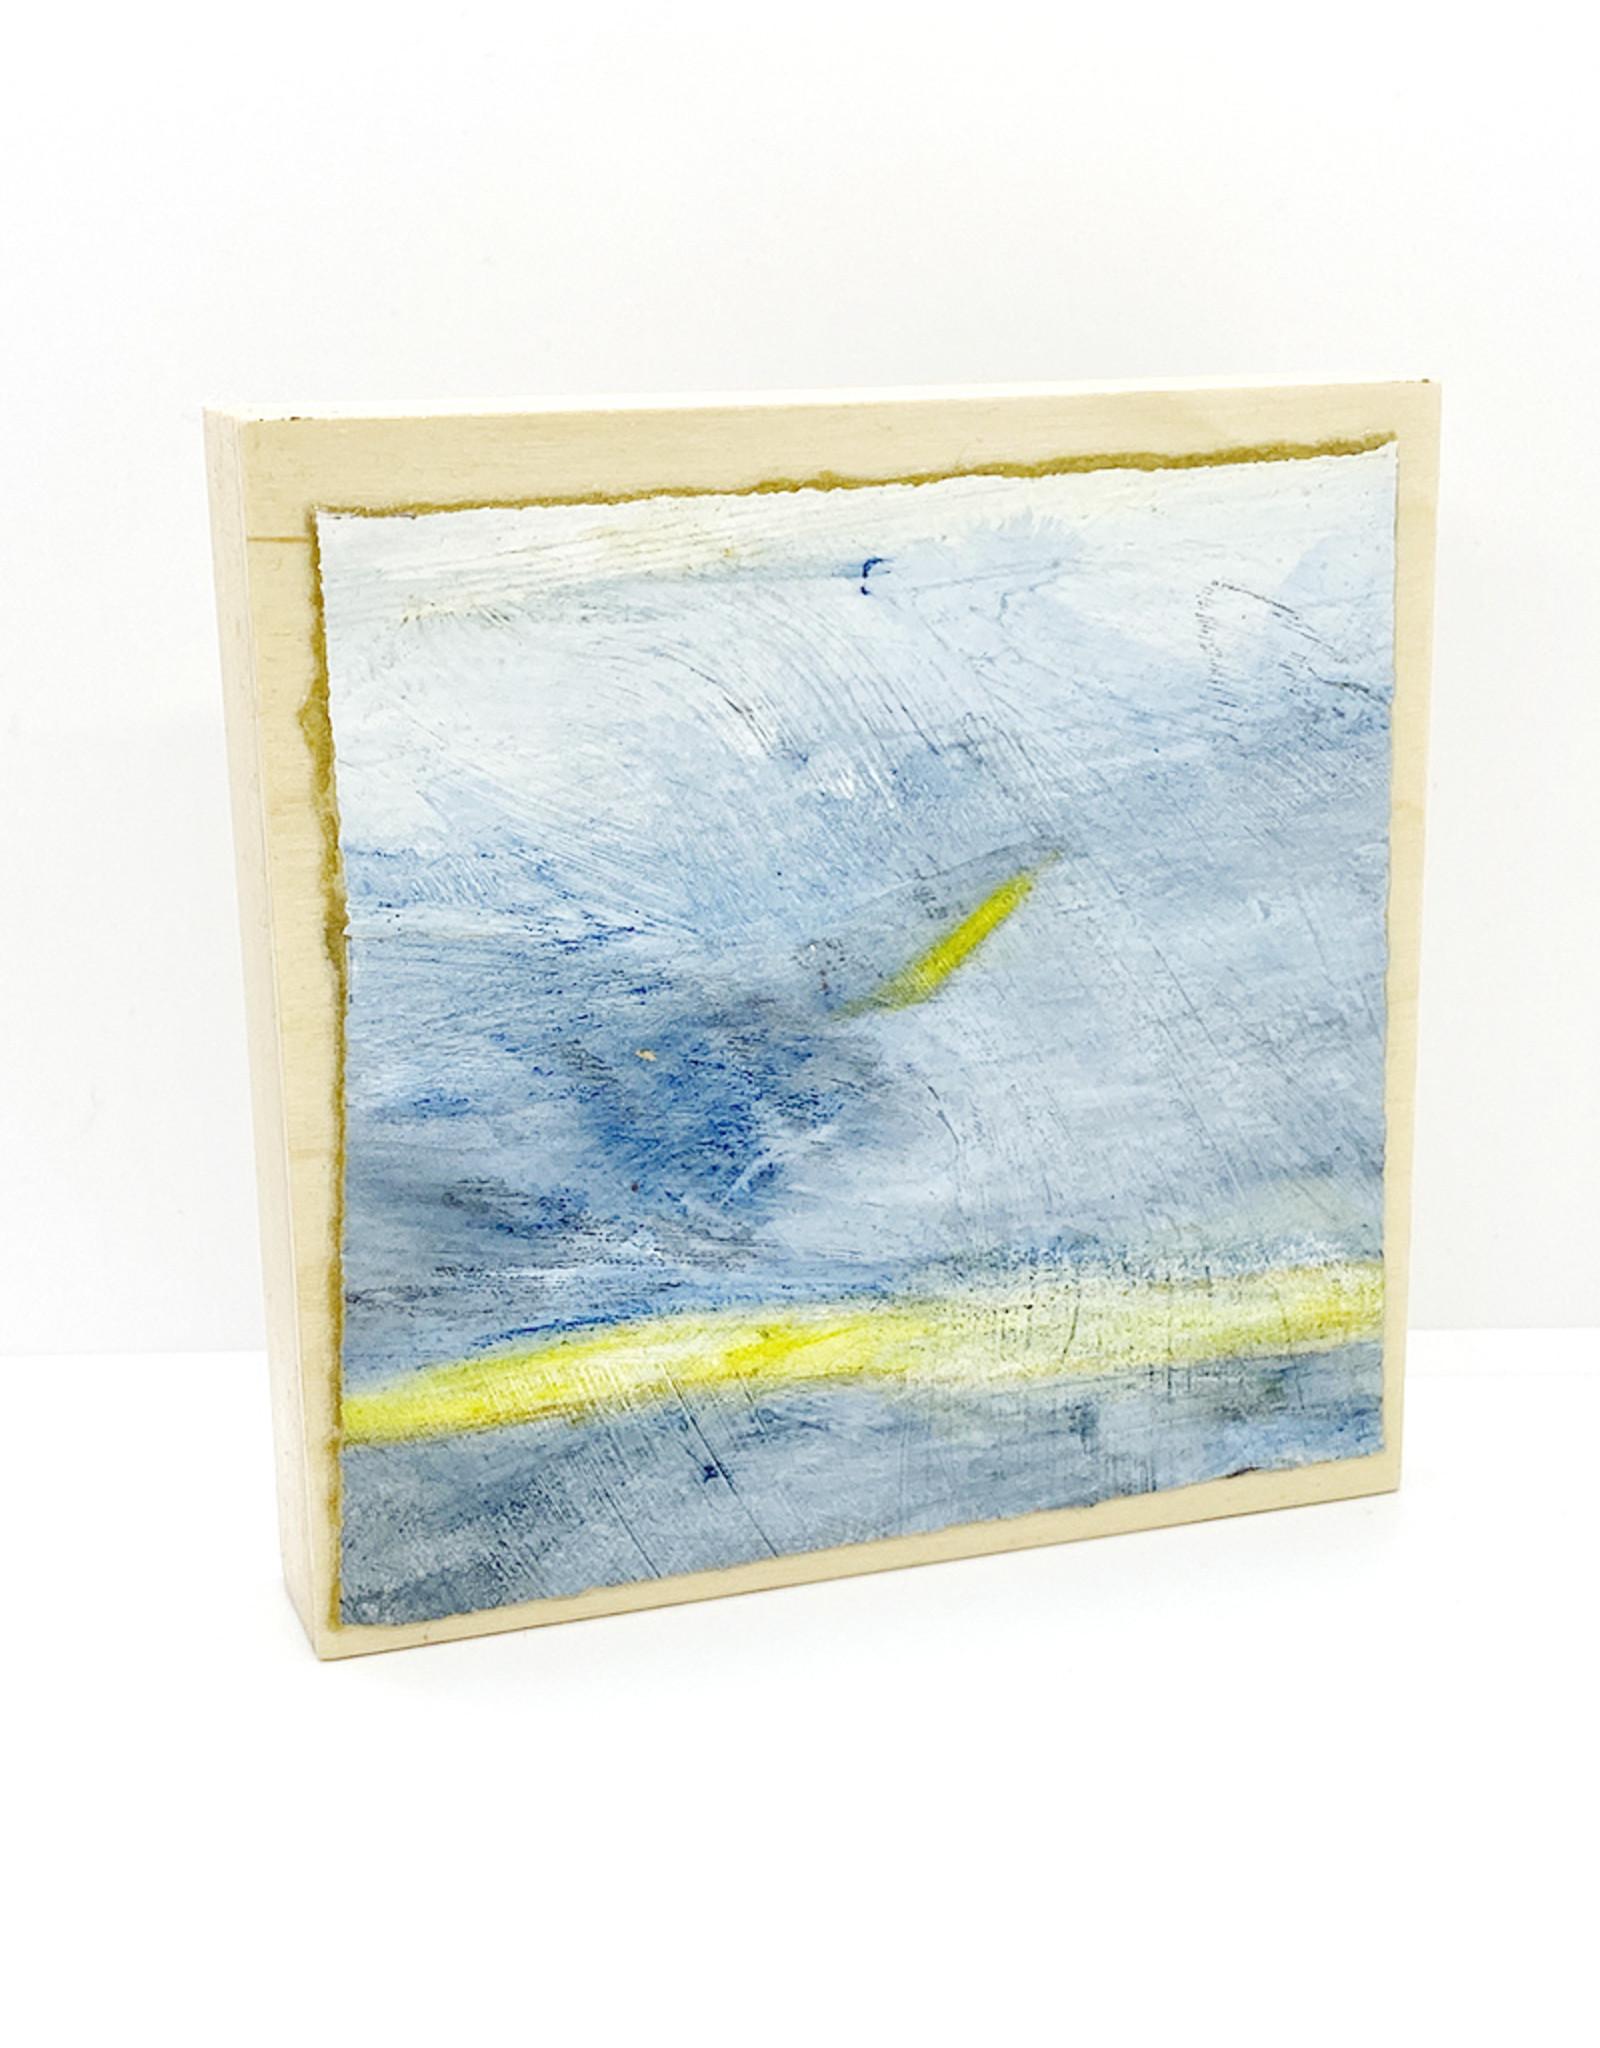 Maryanna Adelman Re:Marks (a series of small paintings) by Maryanna Adelman